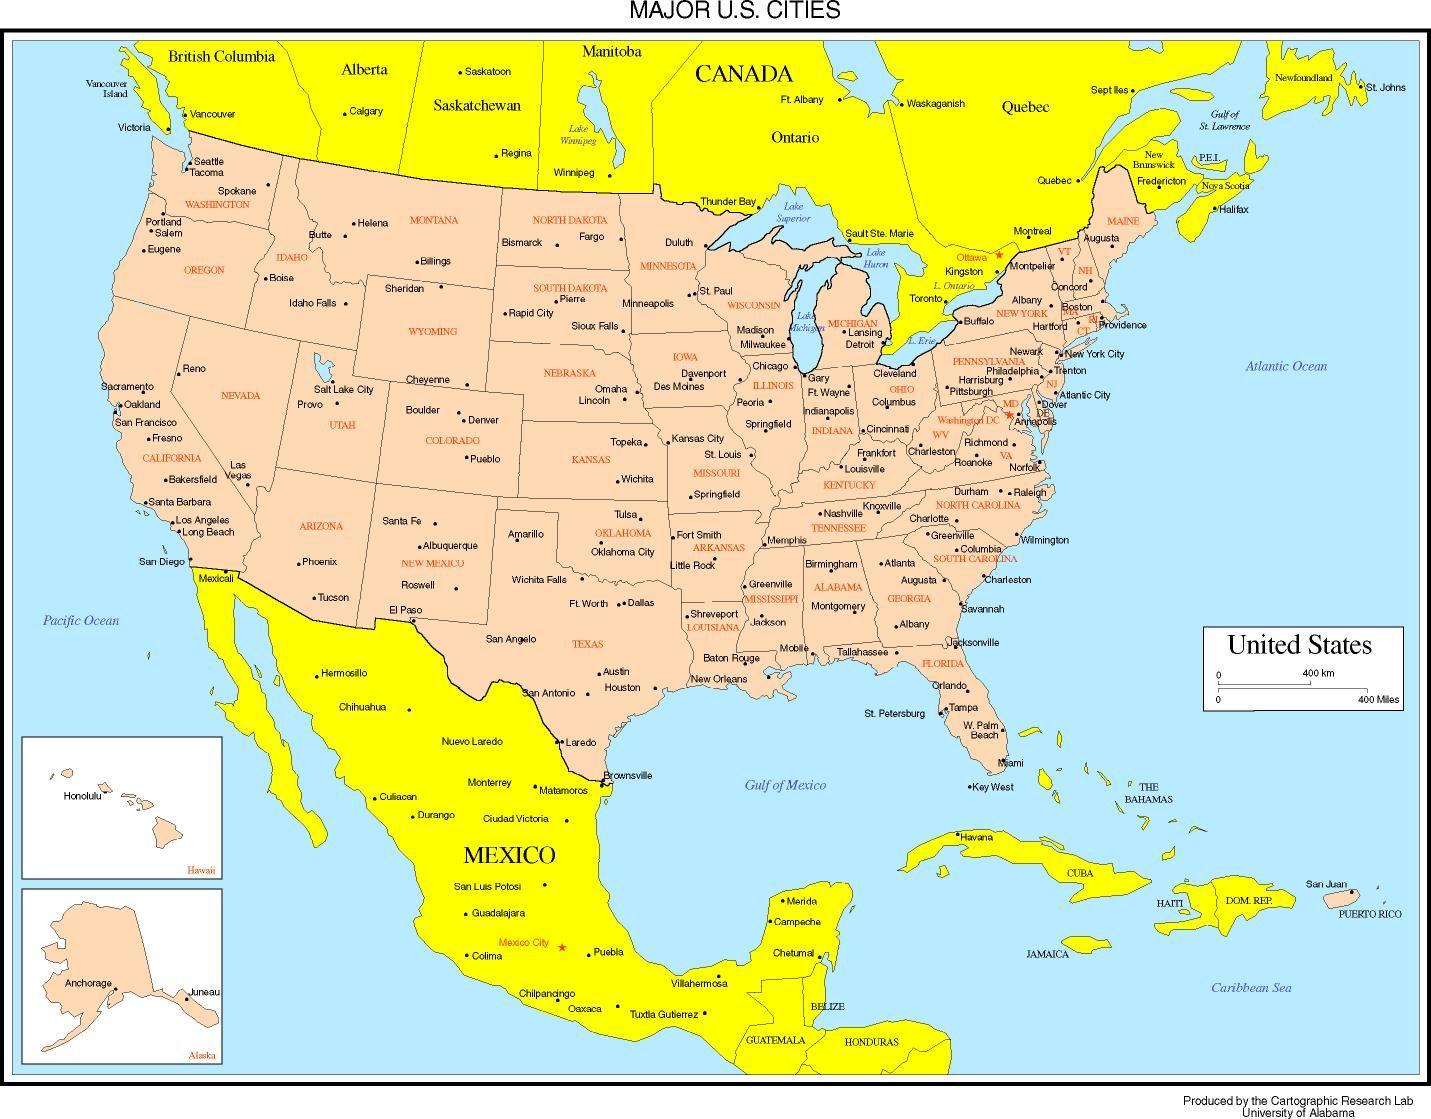 Yahoo United States Map Yahoo Free Download Images World Maps New - Yahoo us weather map